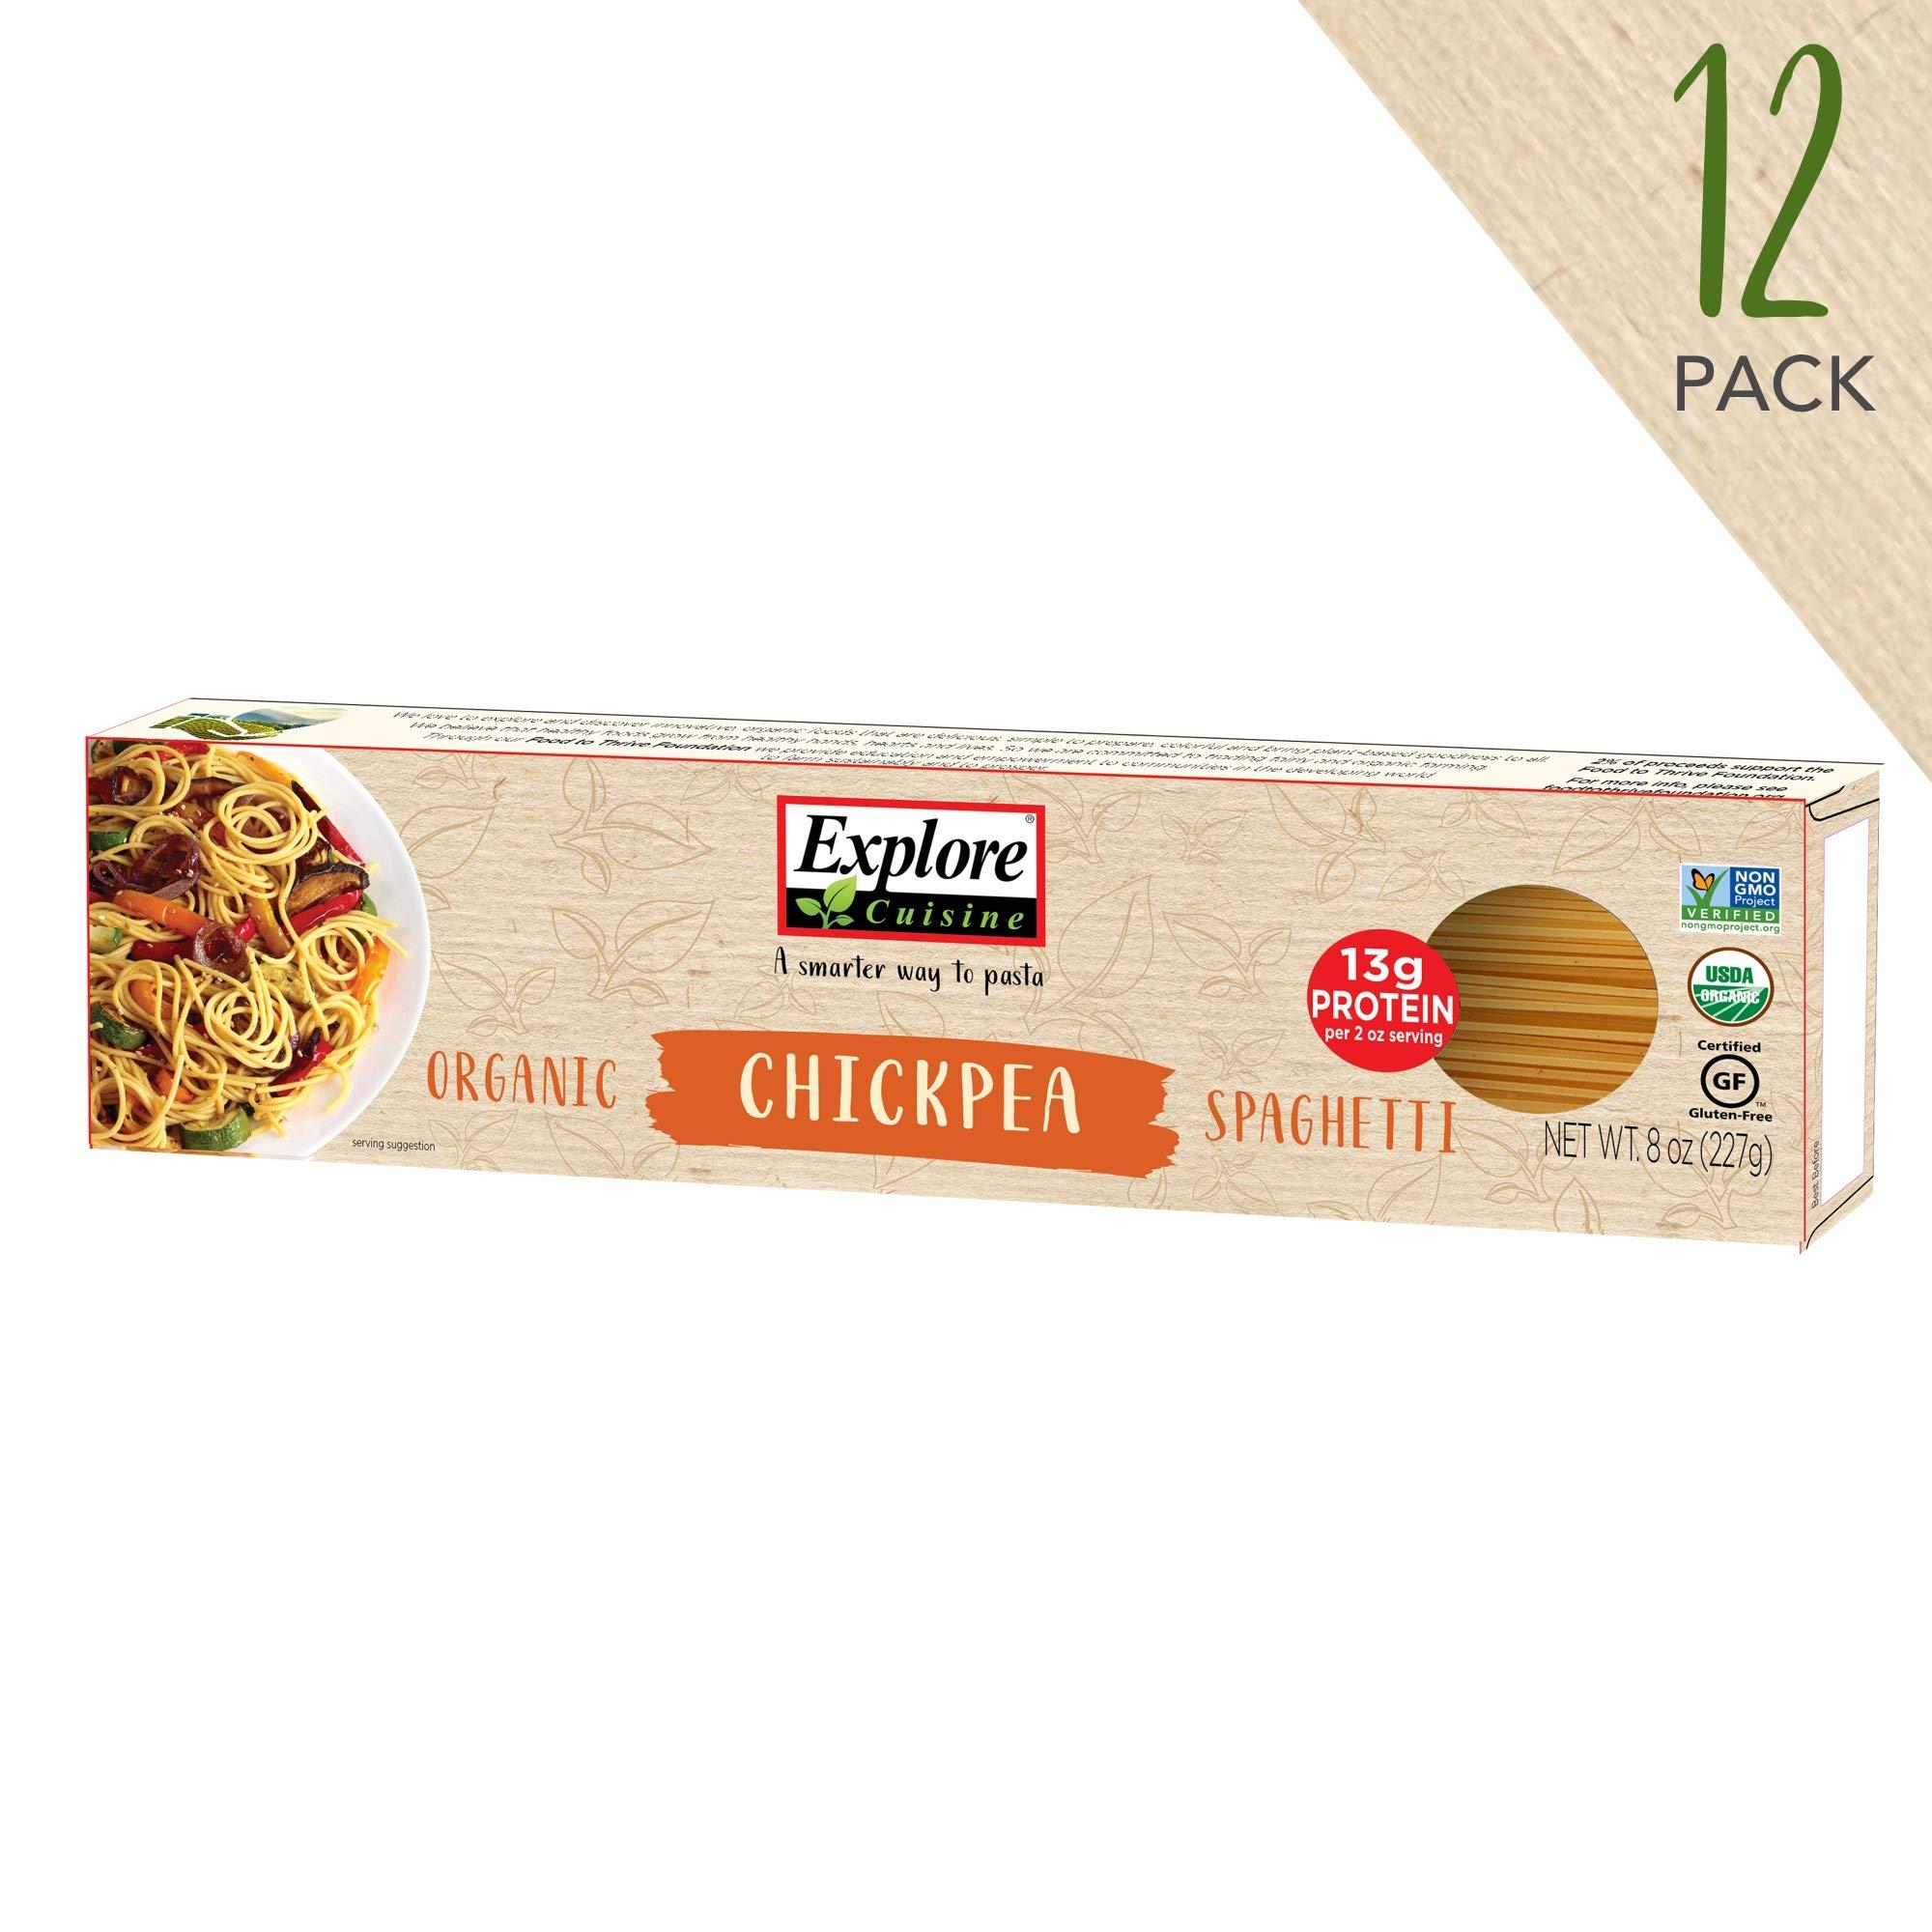 Explore Cuisine Organic Chickpea Spaghetti (12 Pack) - 8 oz - High Protein, Gluten Free Pasta, Easy to Make - USDA Certified Organic, Vegan, Kosher, Non GMO - 48 Total Servings by EXPLORE CUISINE